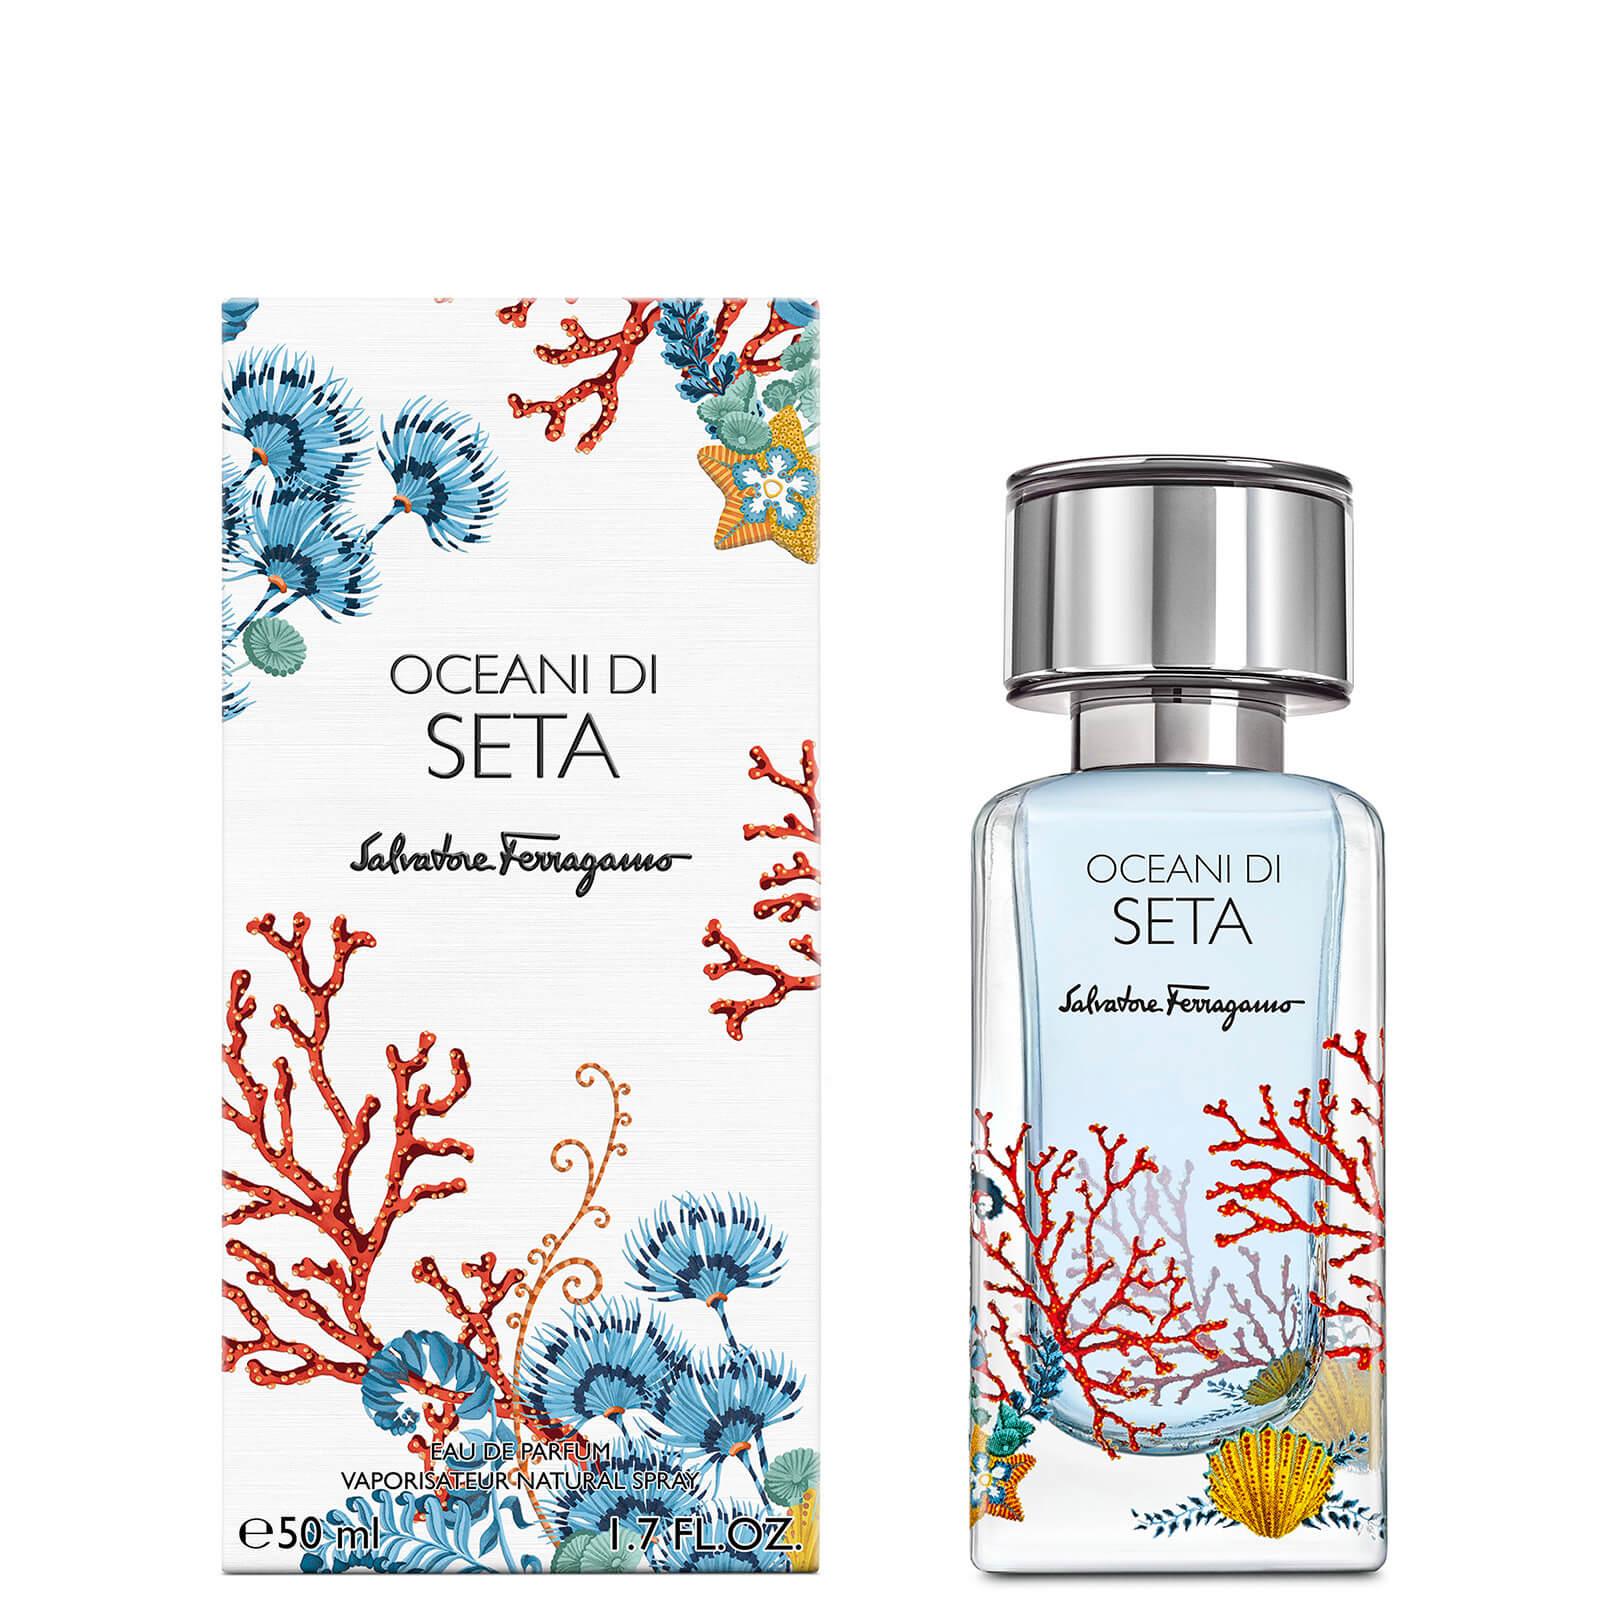 Image of Eau de Parfum Storie Oceane Di Seta Salvatore Ferragamo 50ml